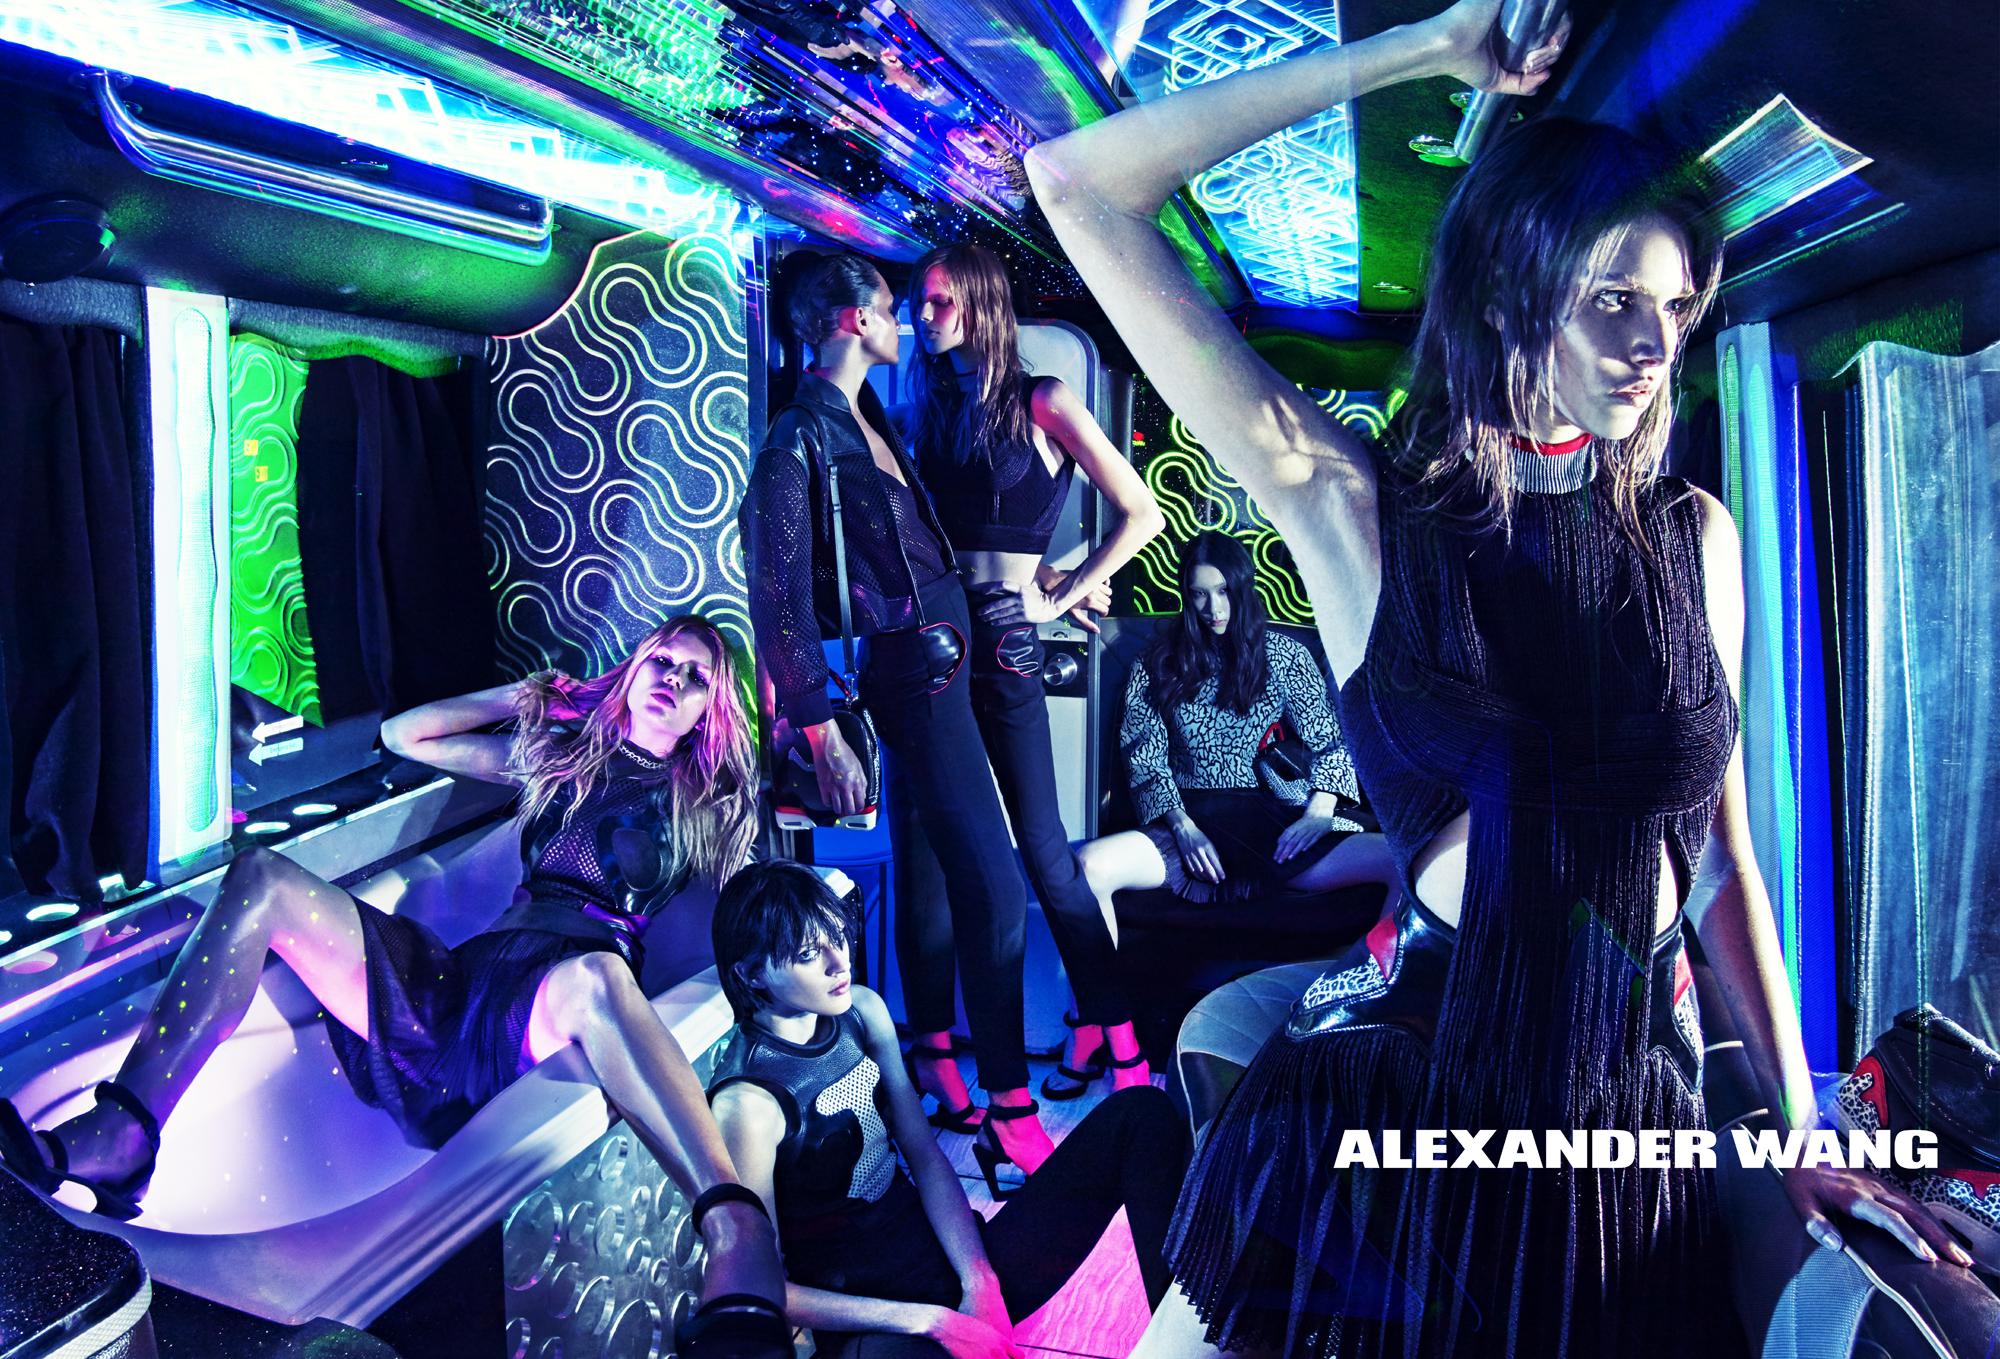 alexander-wang-spring-2015-ad-campaign-03